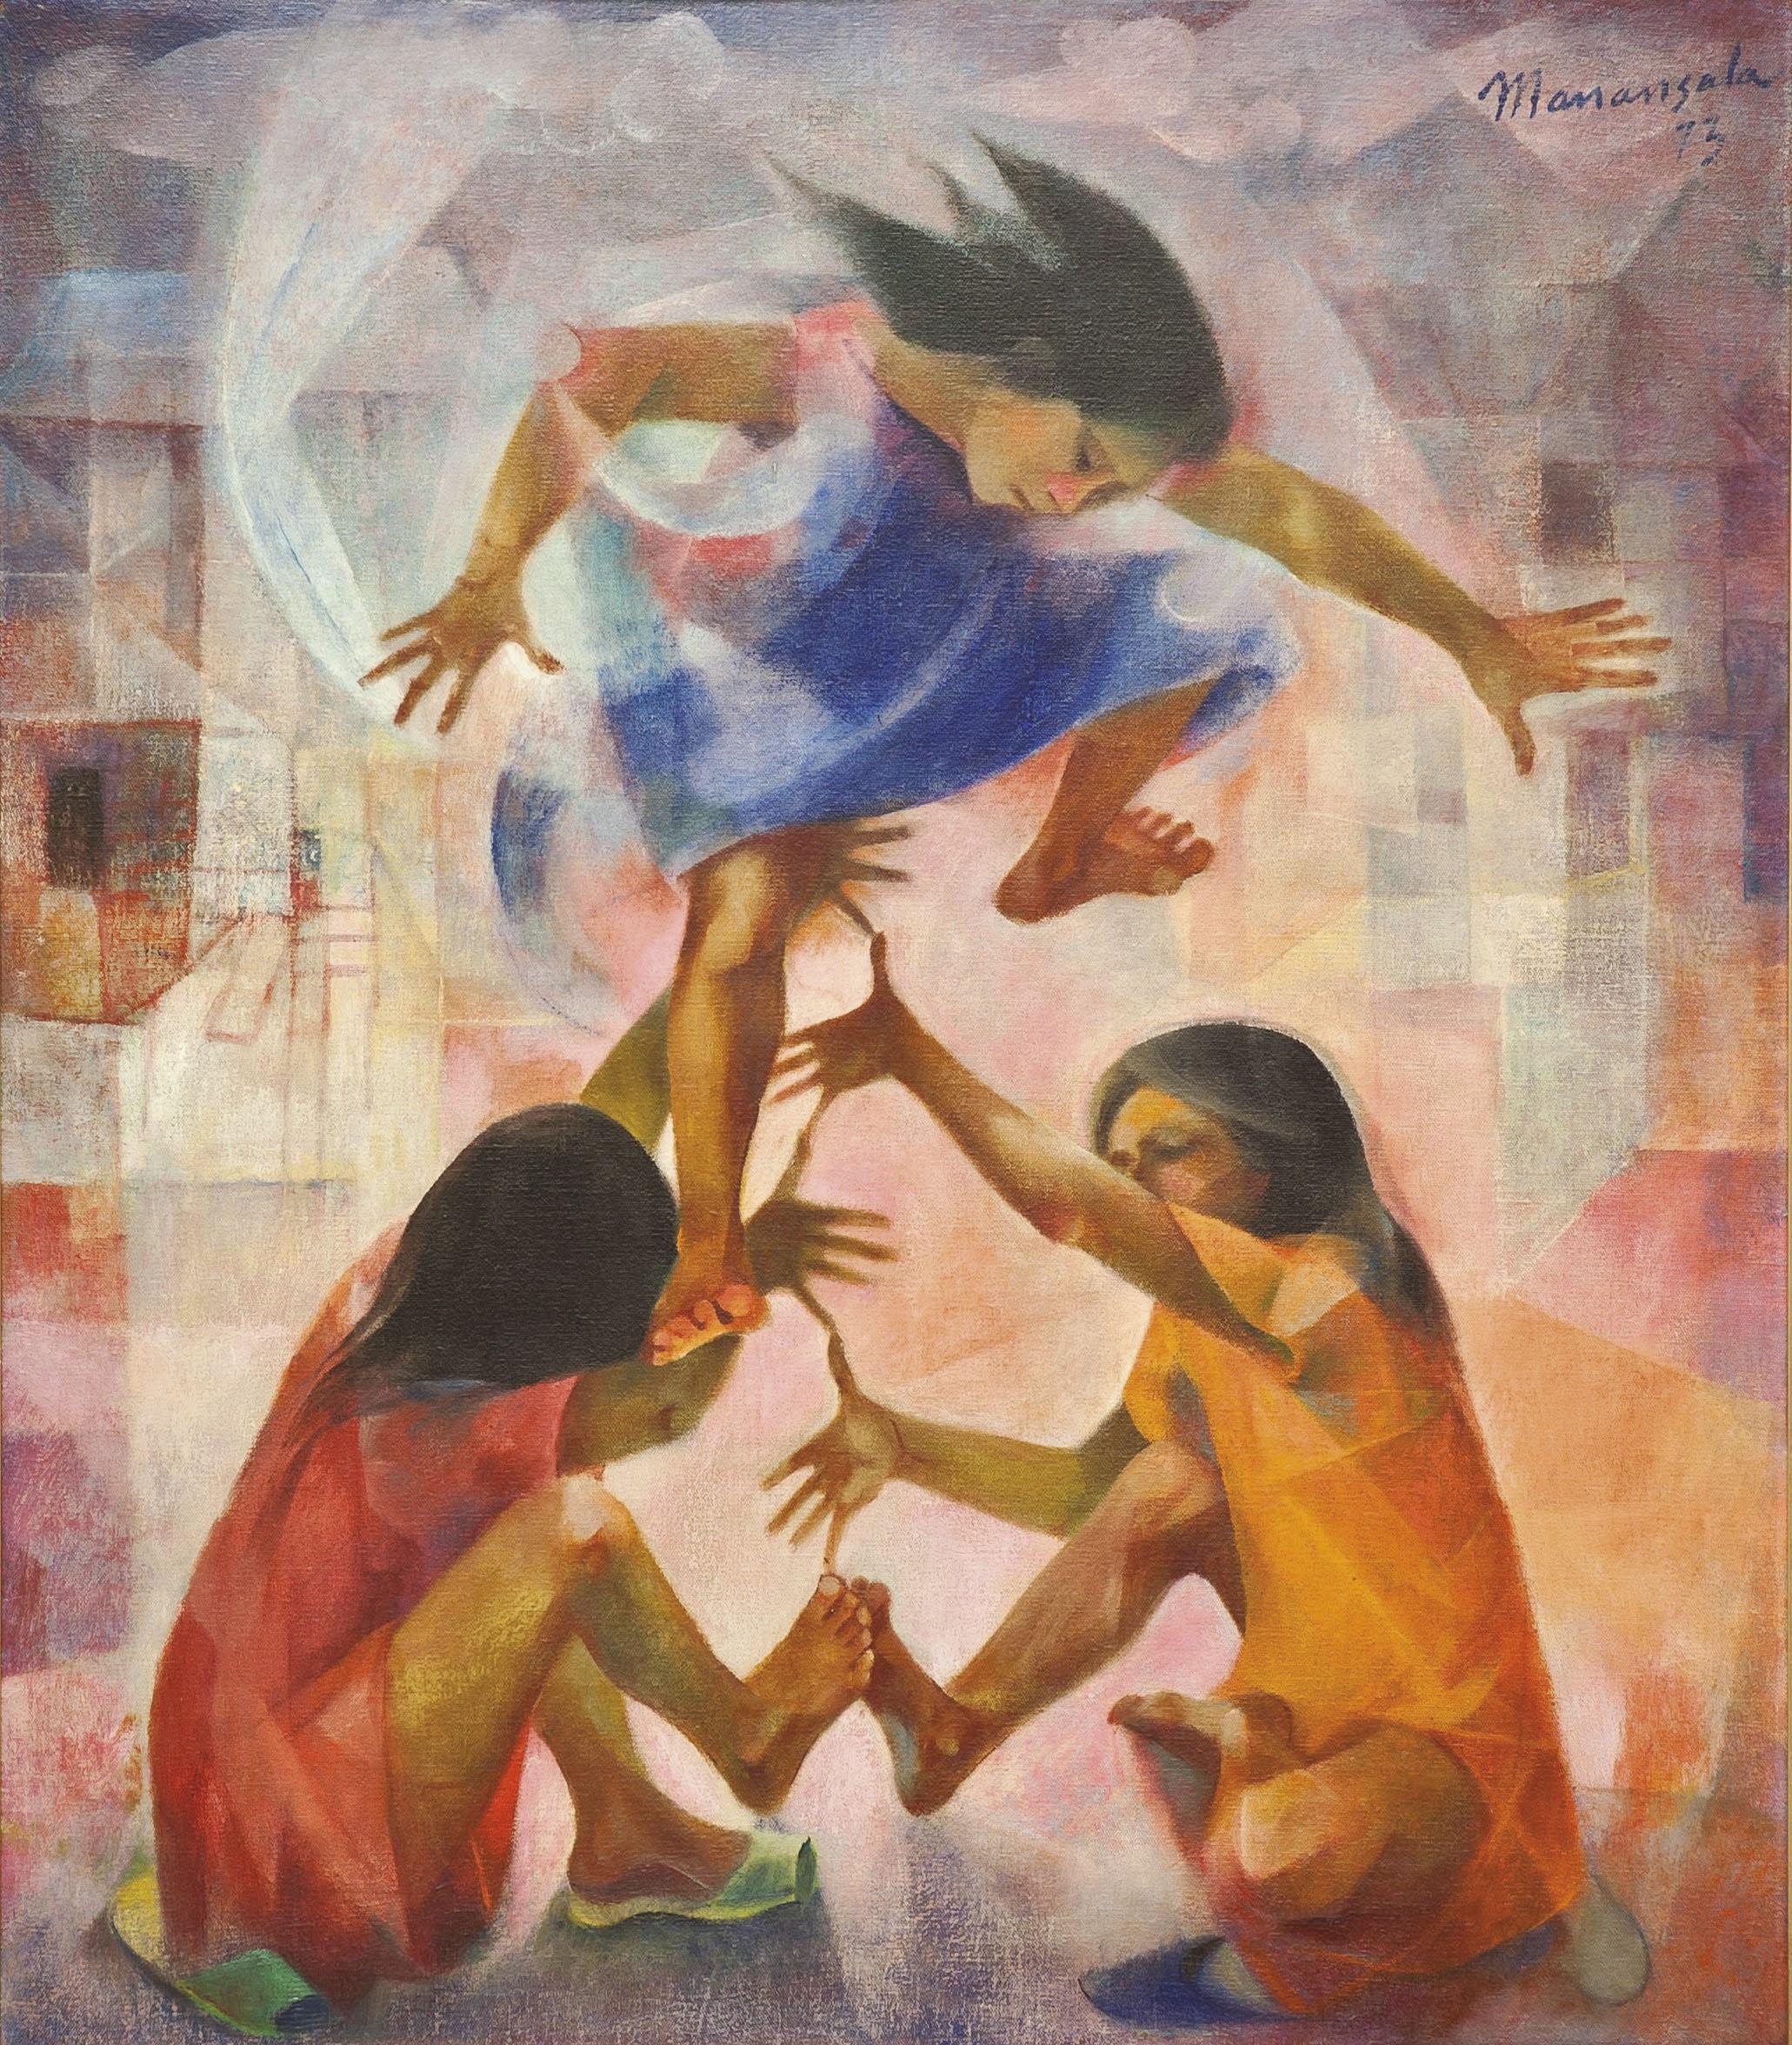 VICENTE SILVA MANANSALA (The Philippines 1910-1981)